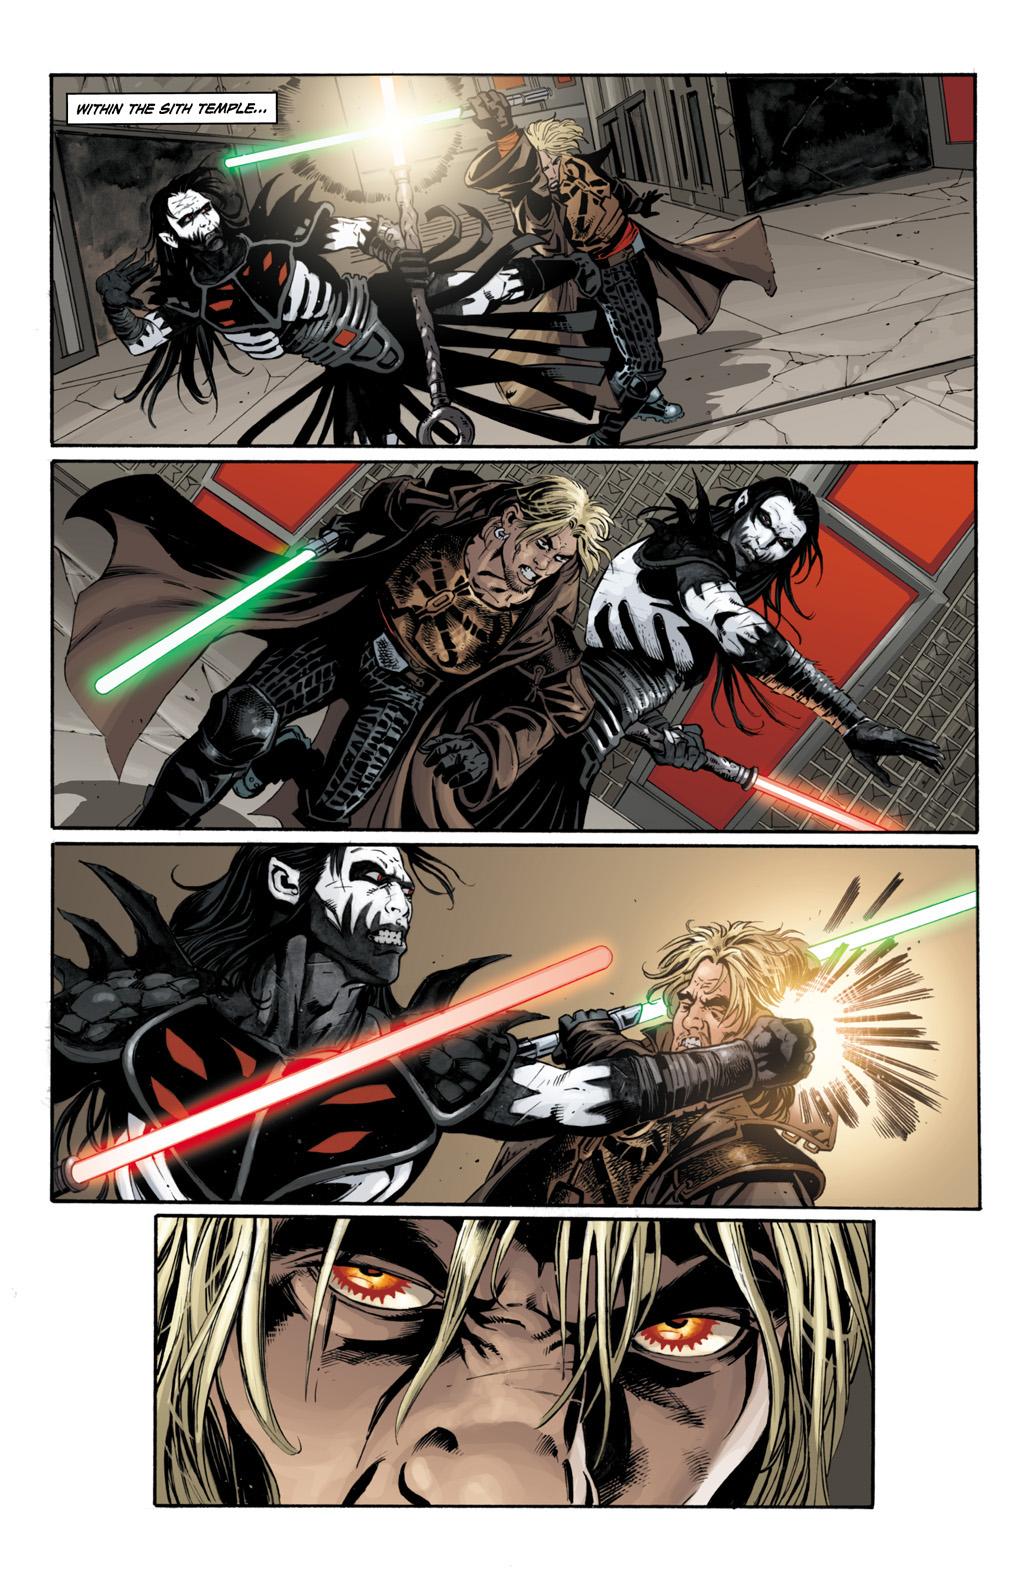 Comic-Only Fights Adapted To Novel Format PxiN5safcGMMEYzVxlBo9xY61LuaigjrlywNUIOXeRZbT81td9VbnJNKoICnN5pn4C9G8OoE-Ux0=s1600